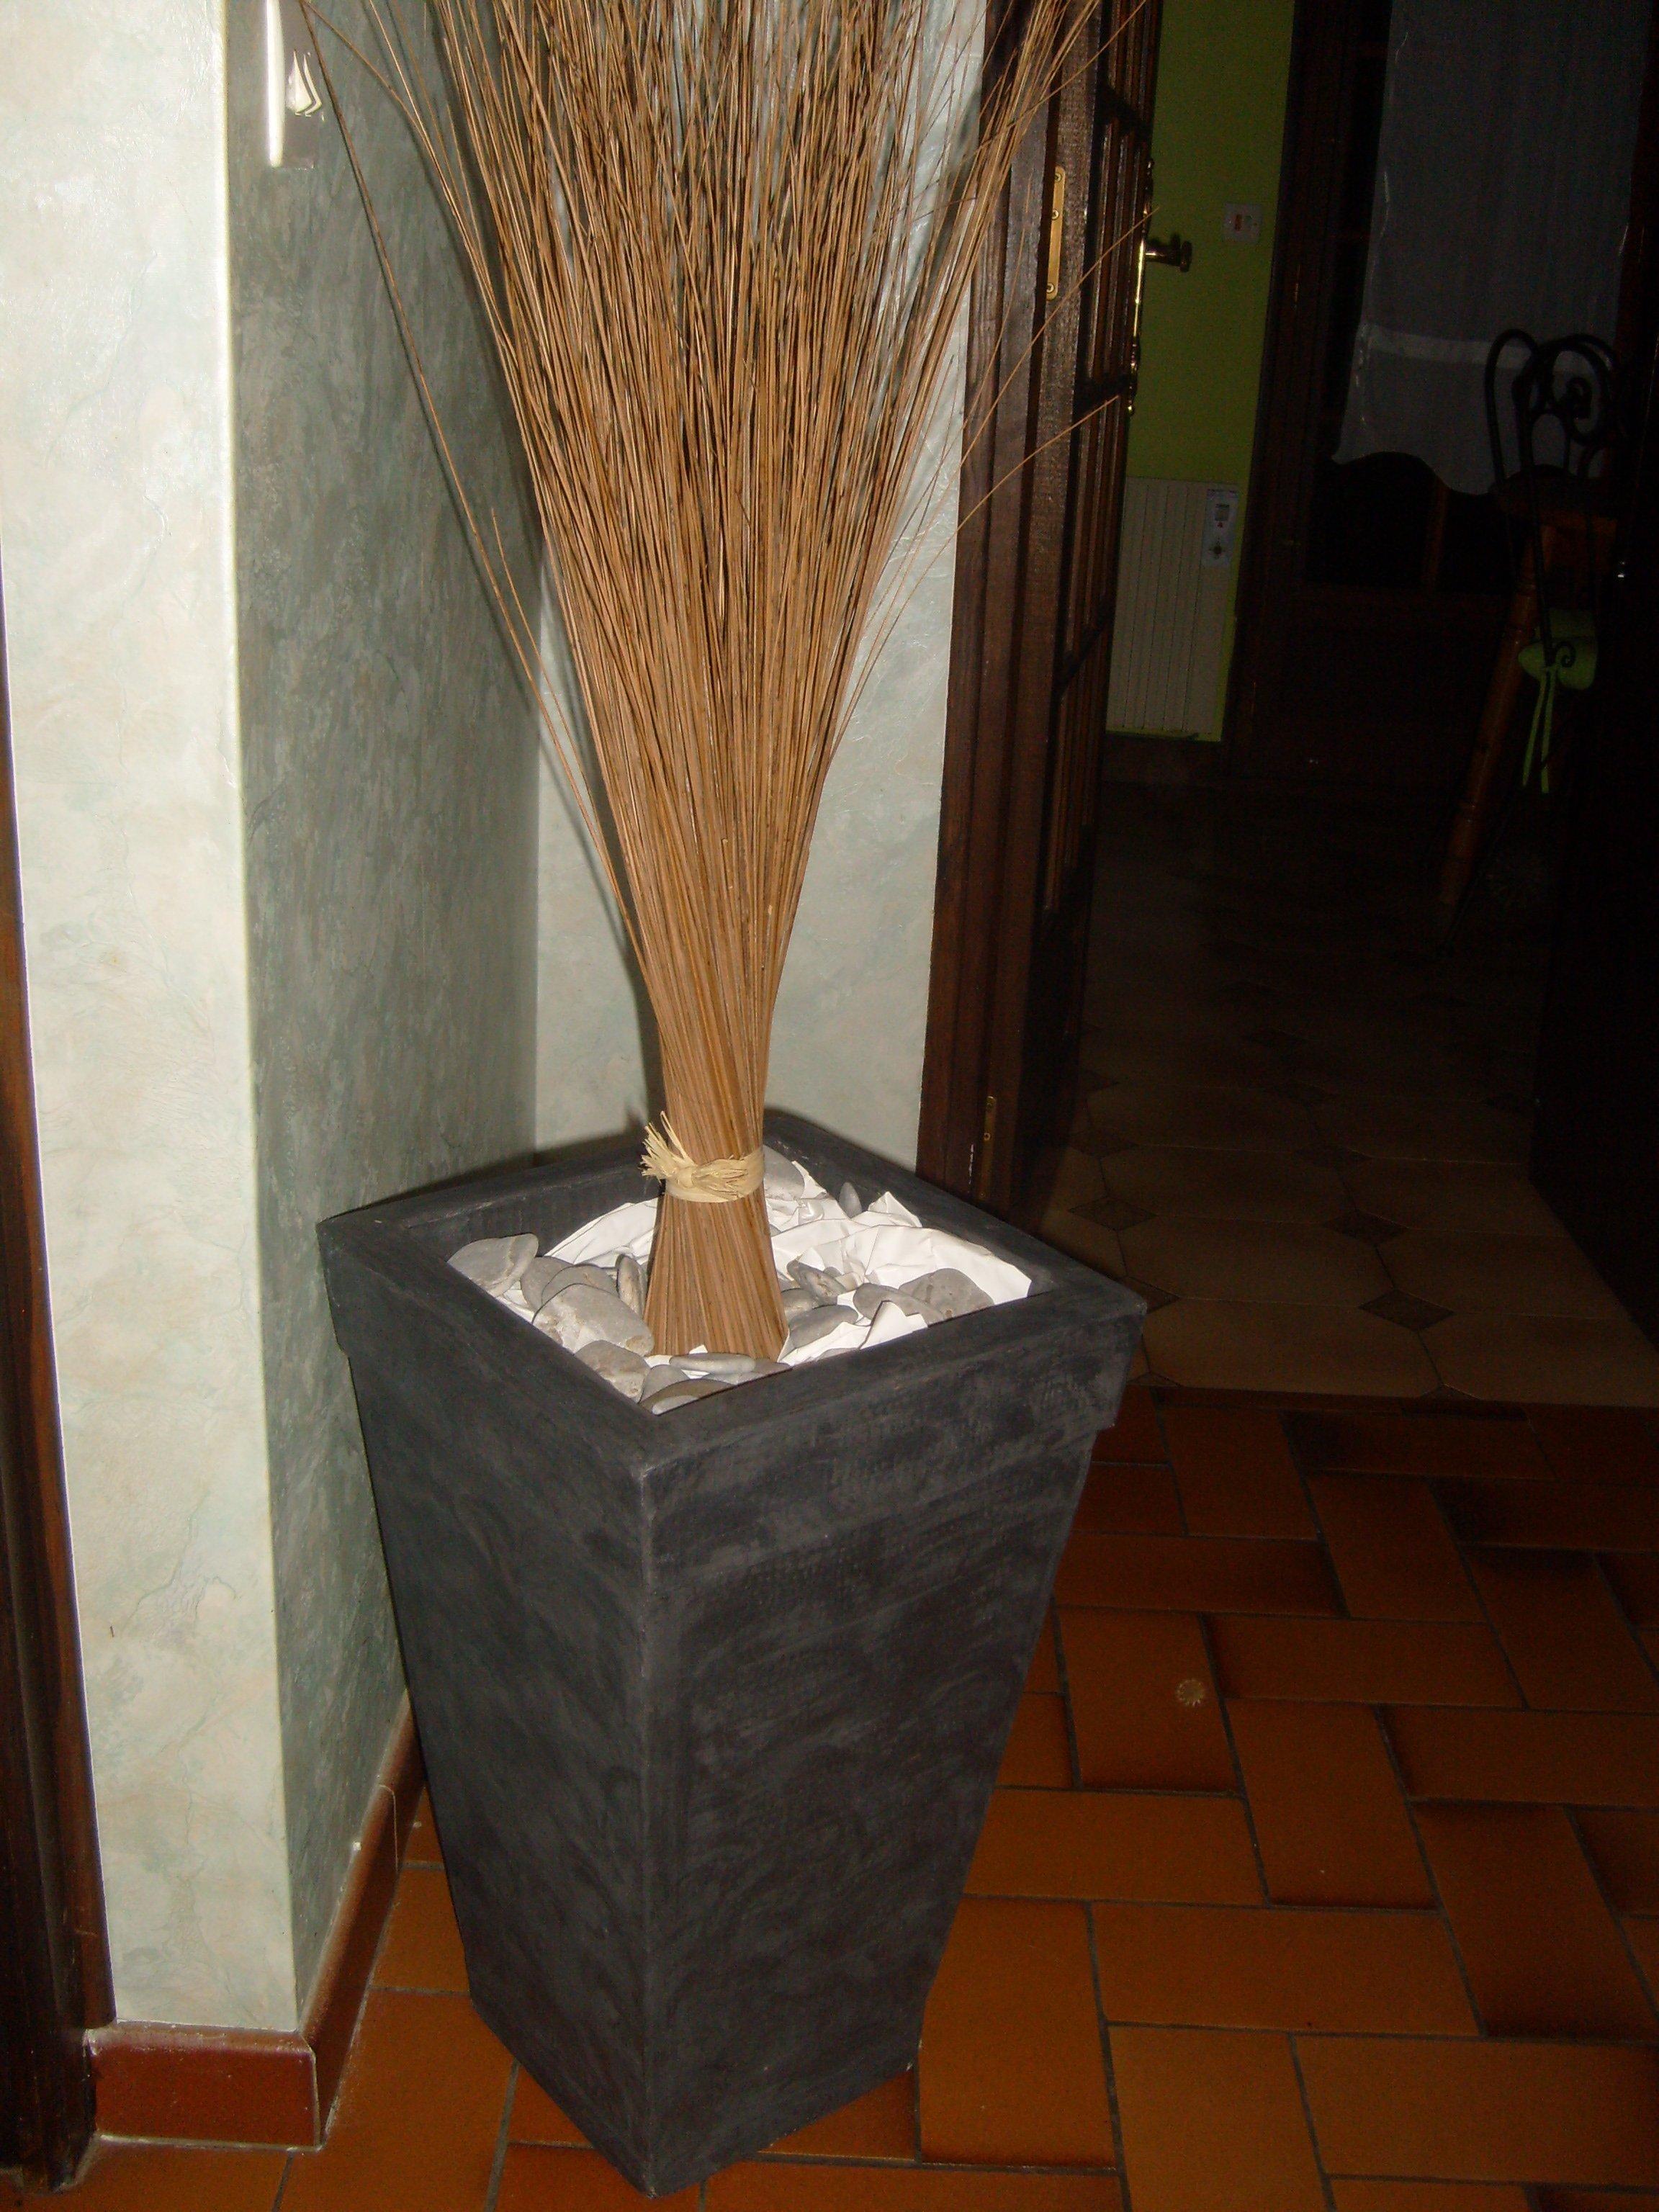 cr ativit c carton. Black Bedroom Furniture Sets. Home Design Ideas